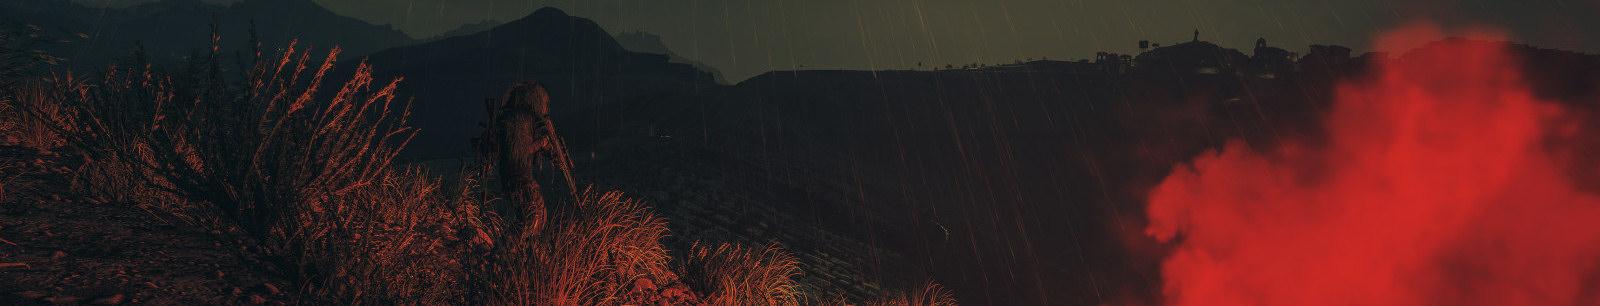 sniper-red-wildlands